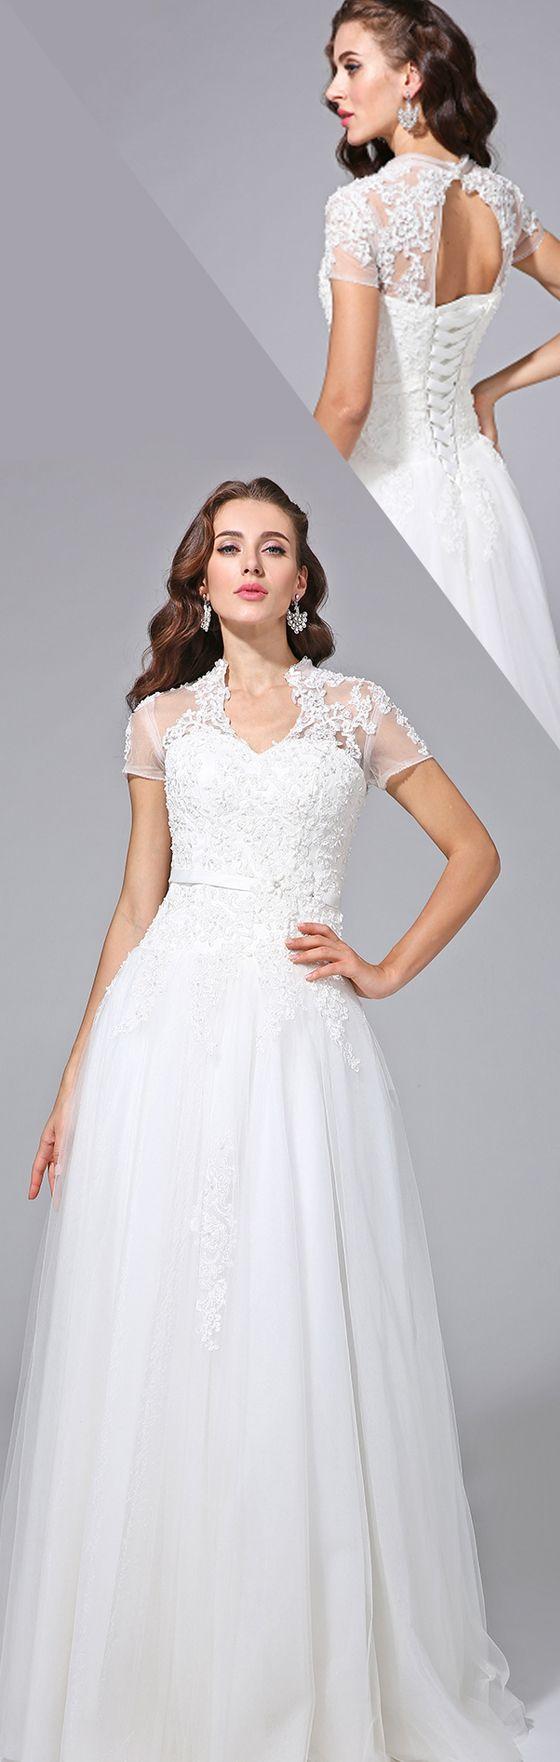 Aline v neck floor length lace over tulle madetomeasure wedding